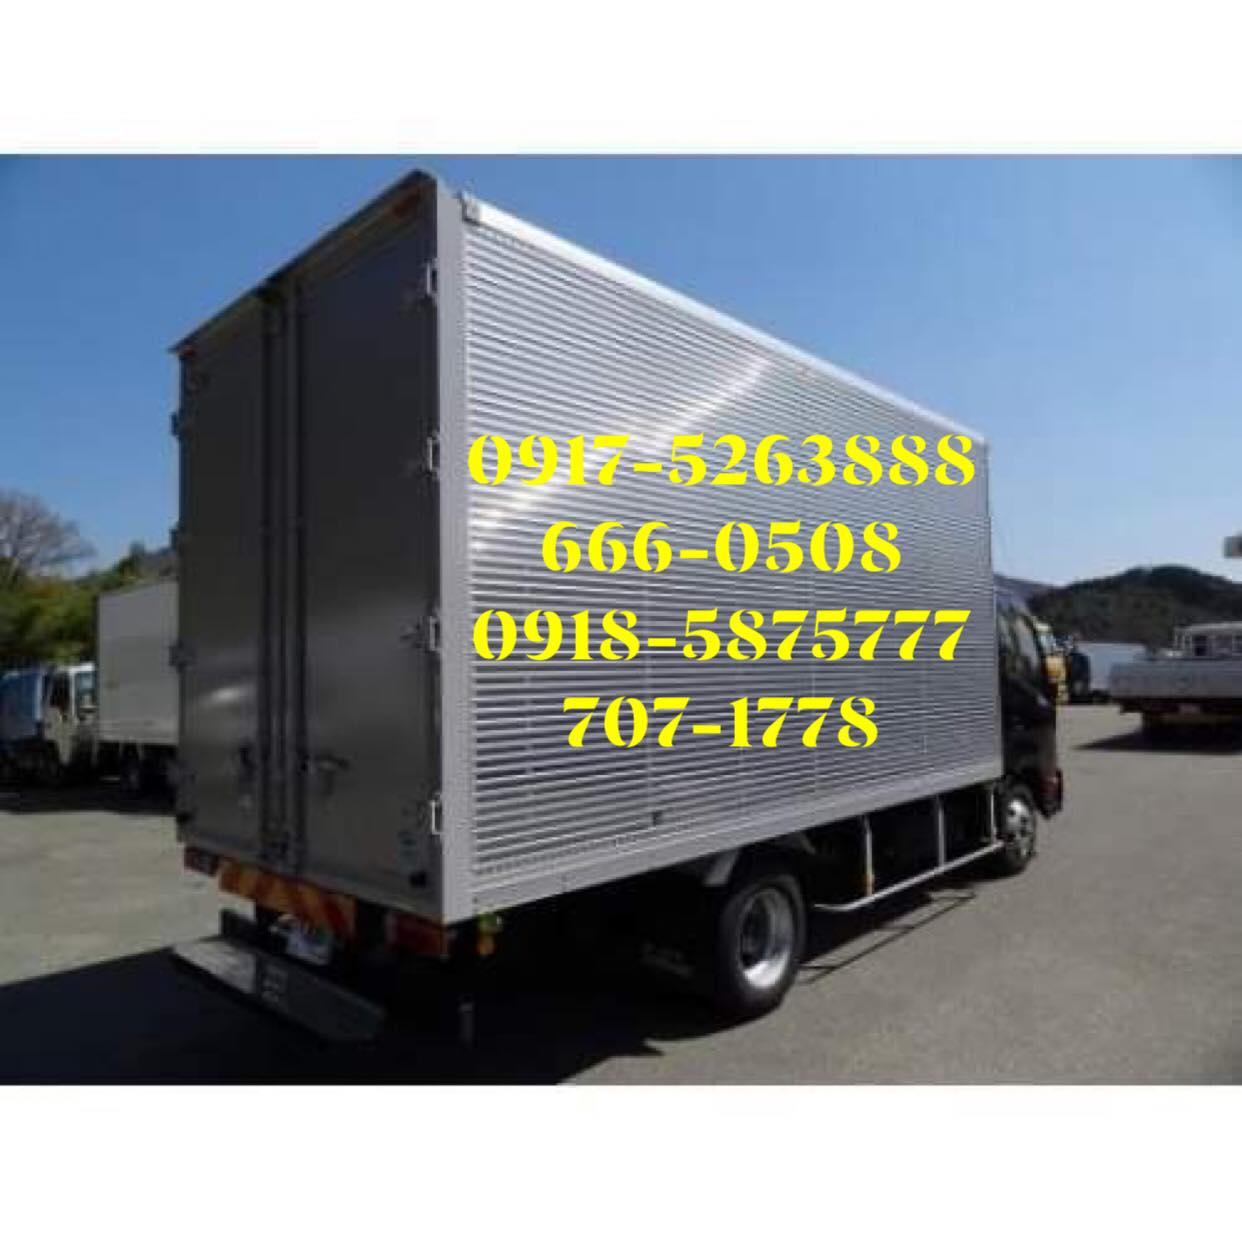 Jrayala trucking service